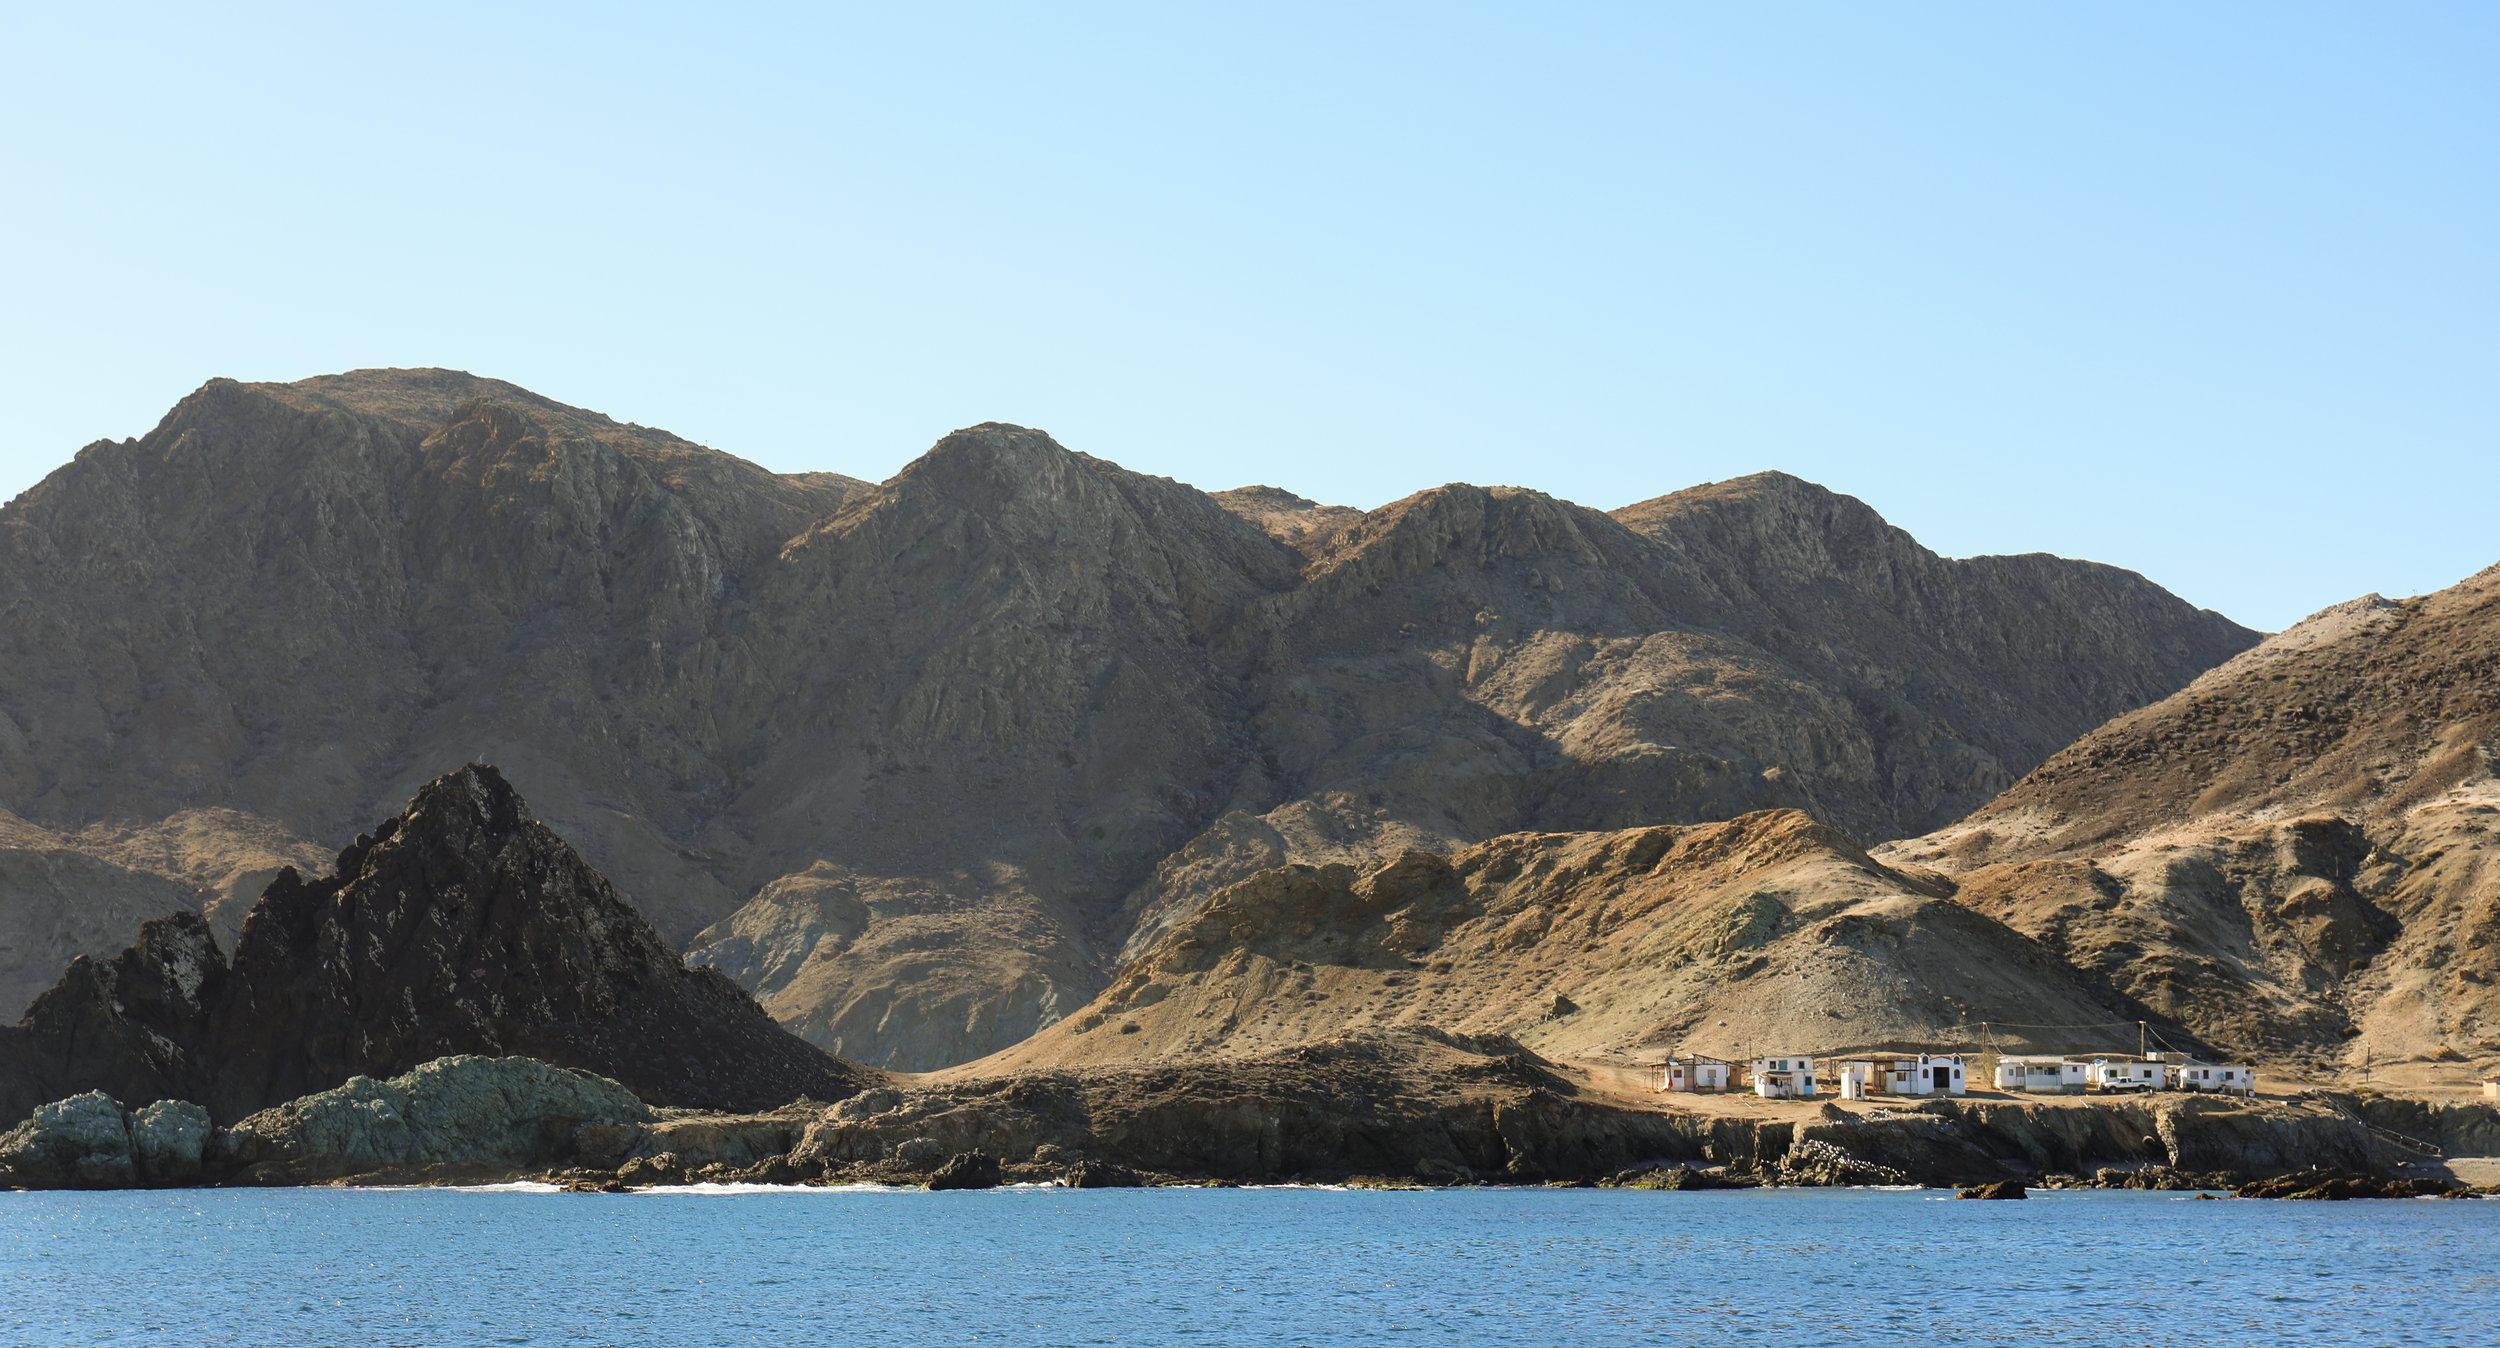 Approaching Cedros Island